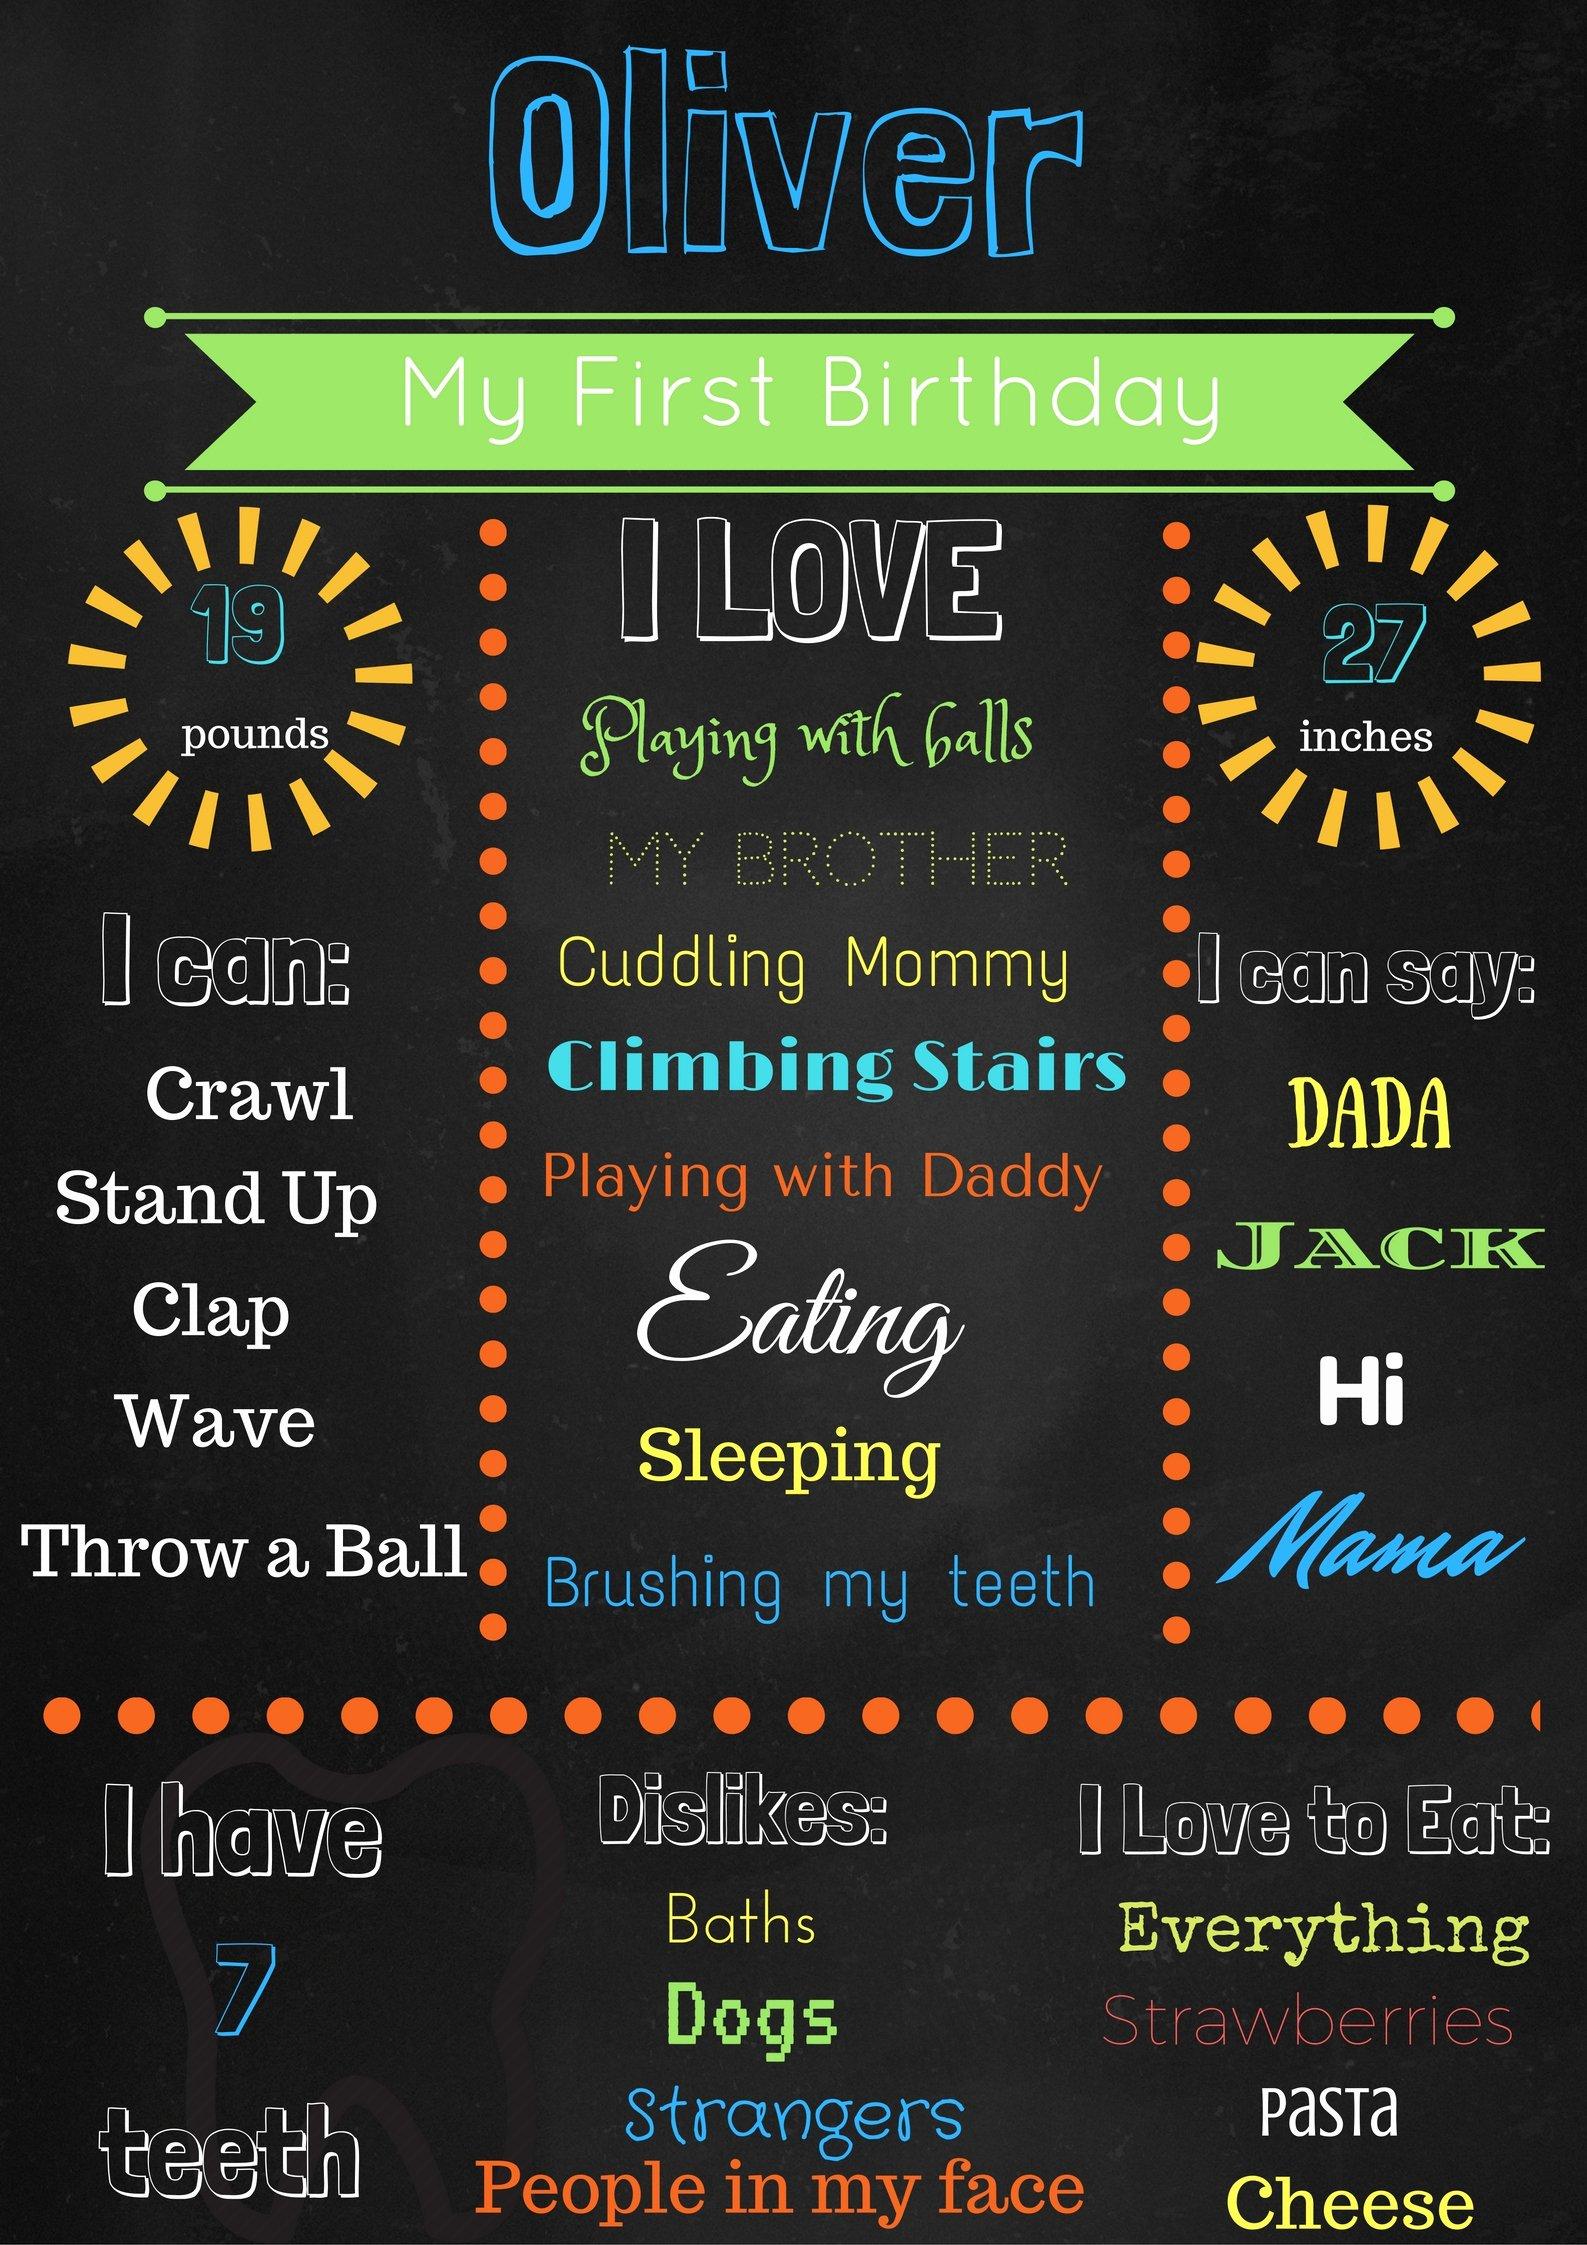 Chalkboard Birthday Sign Template Beautiful Free Editable and Printable Chalkboard Birthday Poster